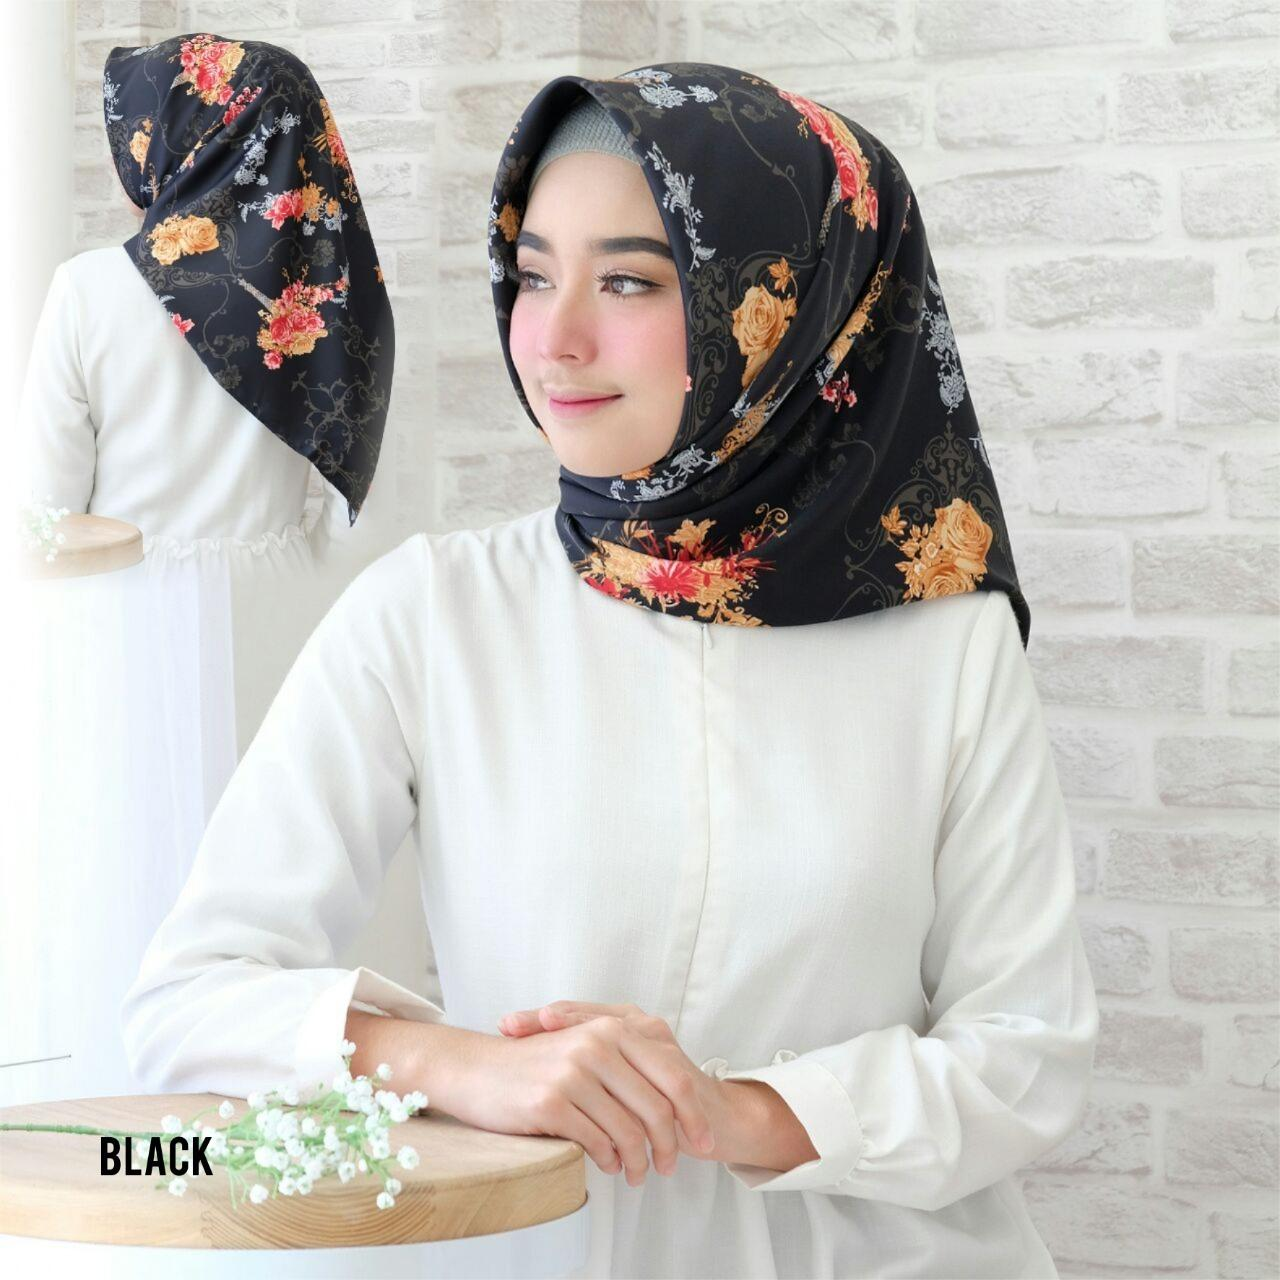 Hijab Kananta Jilbab Segi Empat Motif/ Hijab Motif Bunga Kain Velvet Premium Maxmara Square K-Diandra